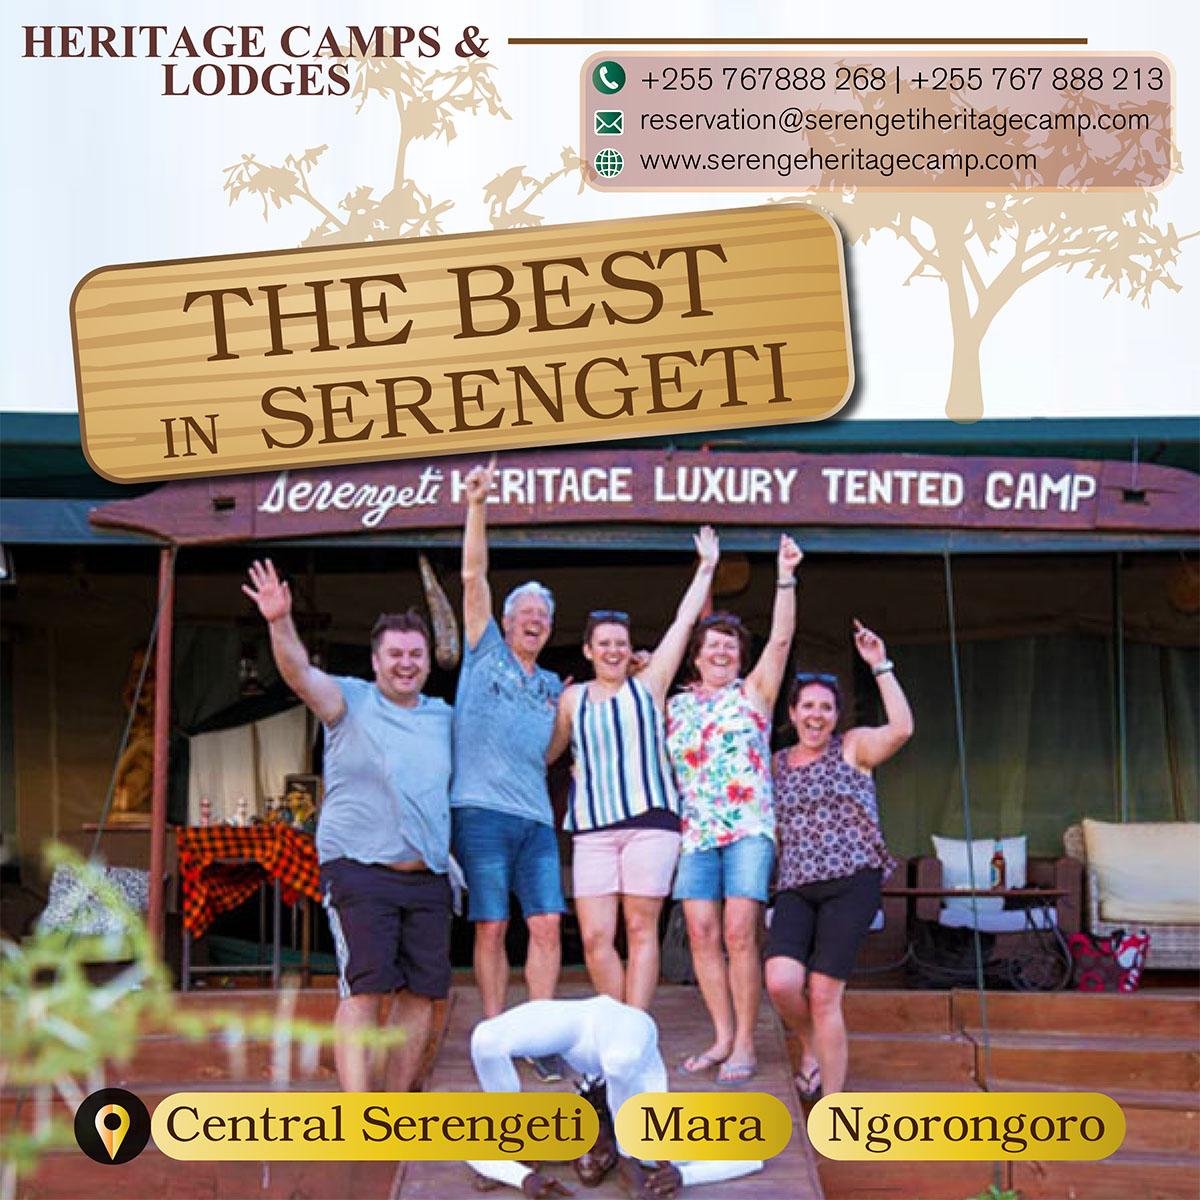 Heritage Camps & Lodges Serengeti Tanzania